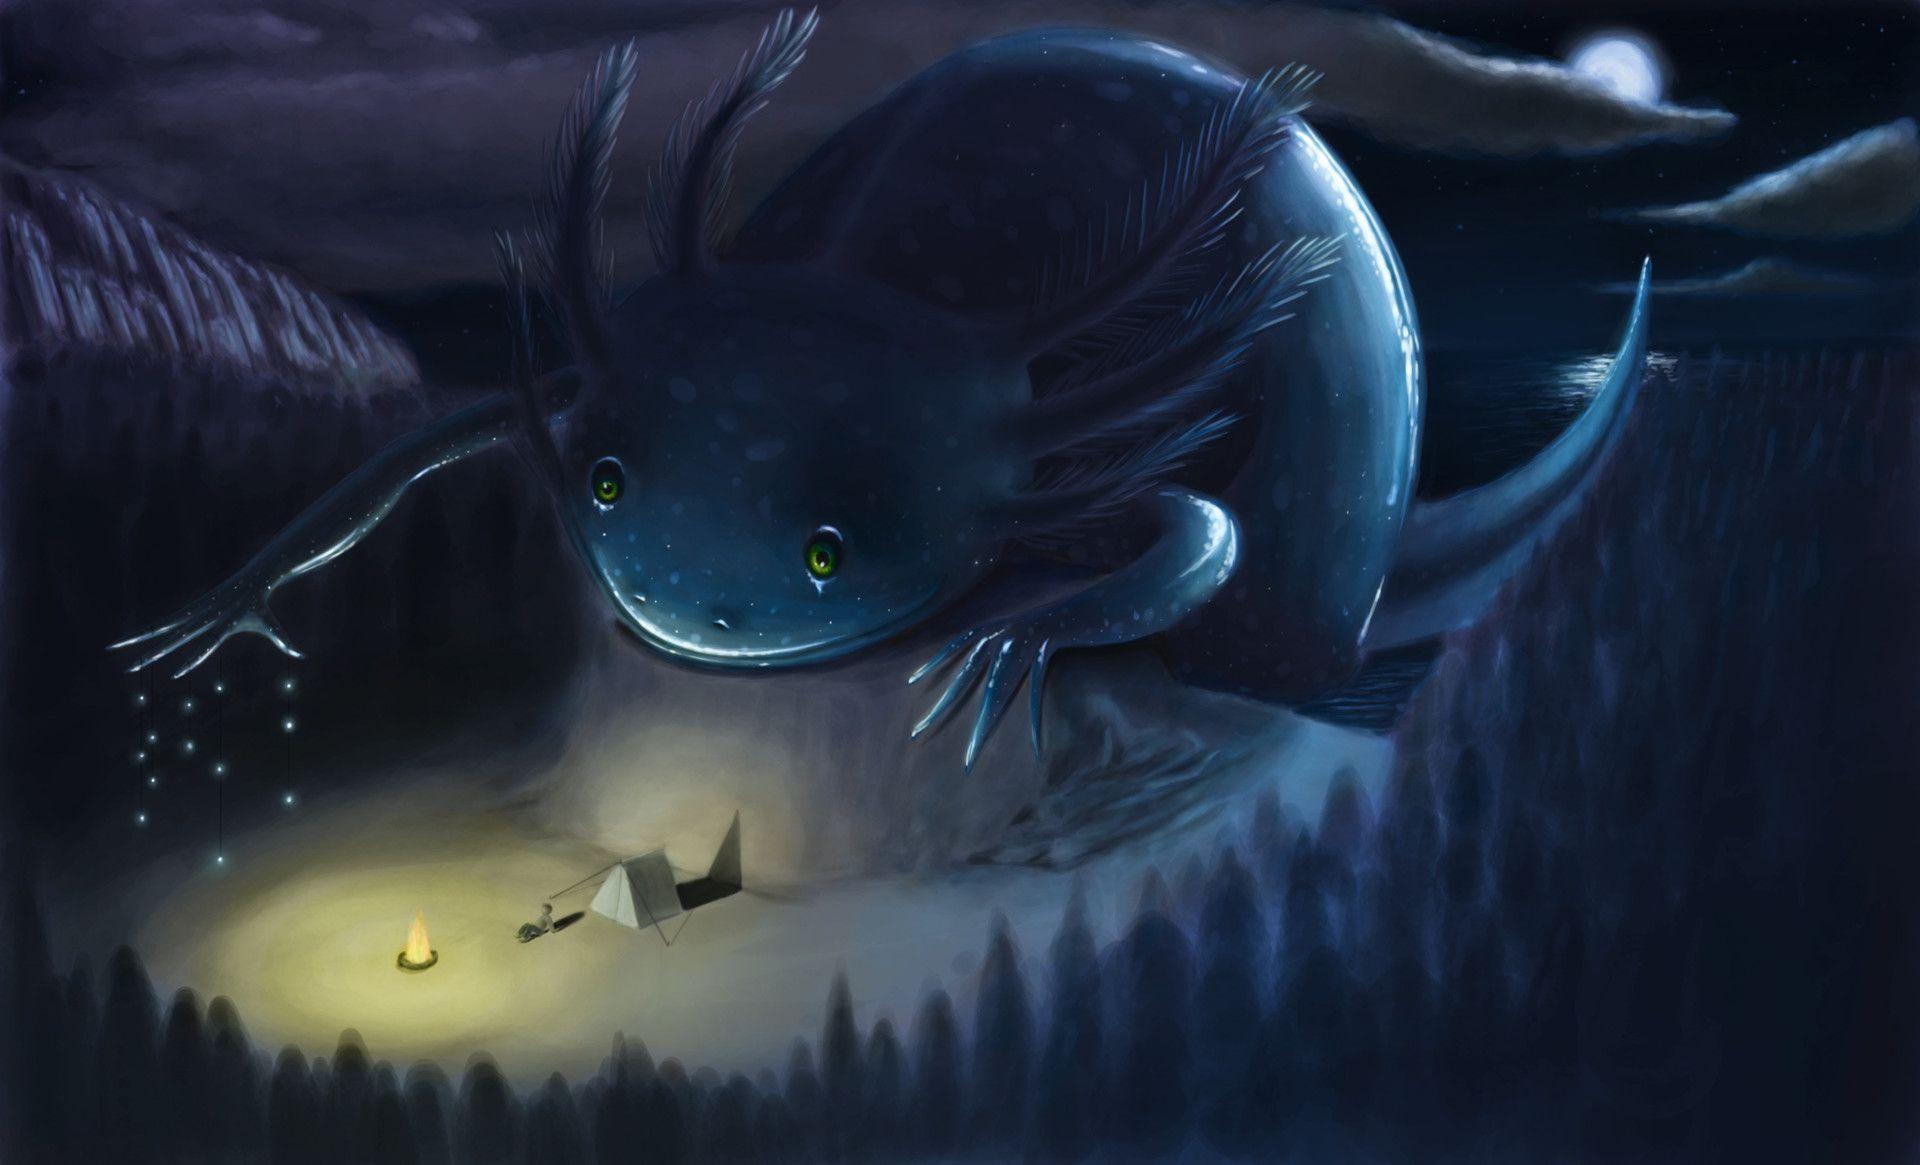 Axolotl Wallpapers  Axolotl Creatures Mystical 1920x1165